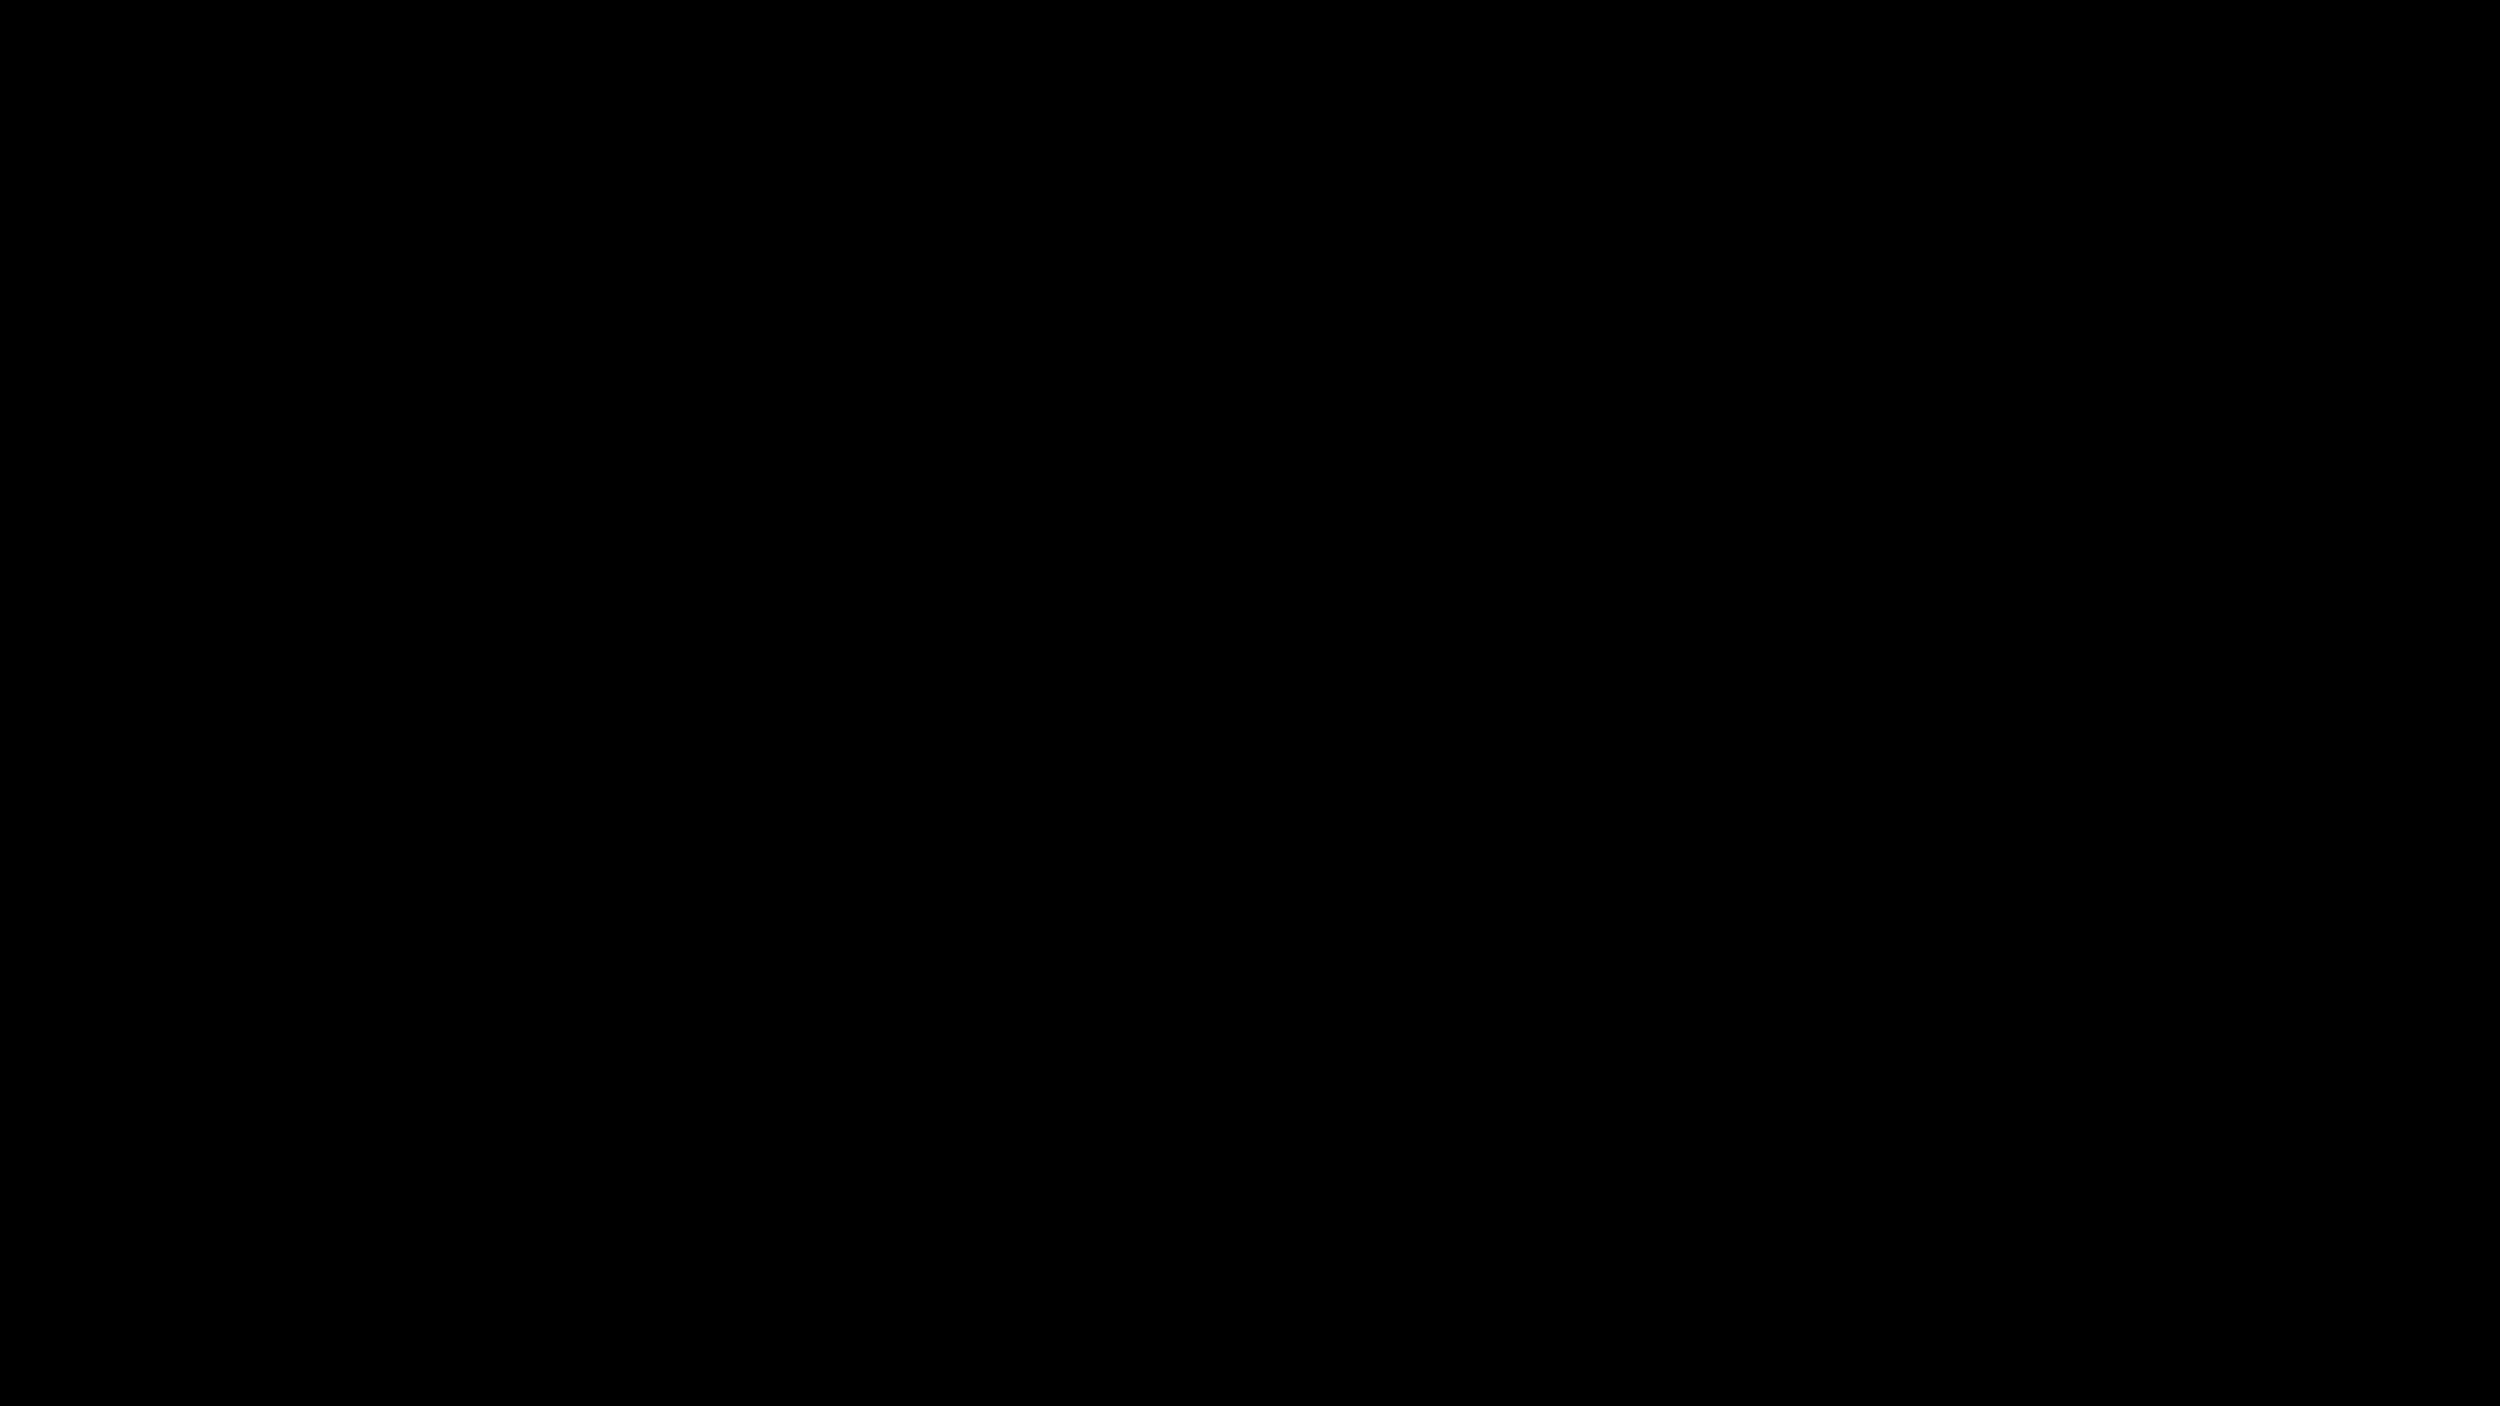 unh_ap-02.png